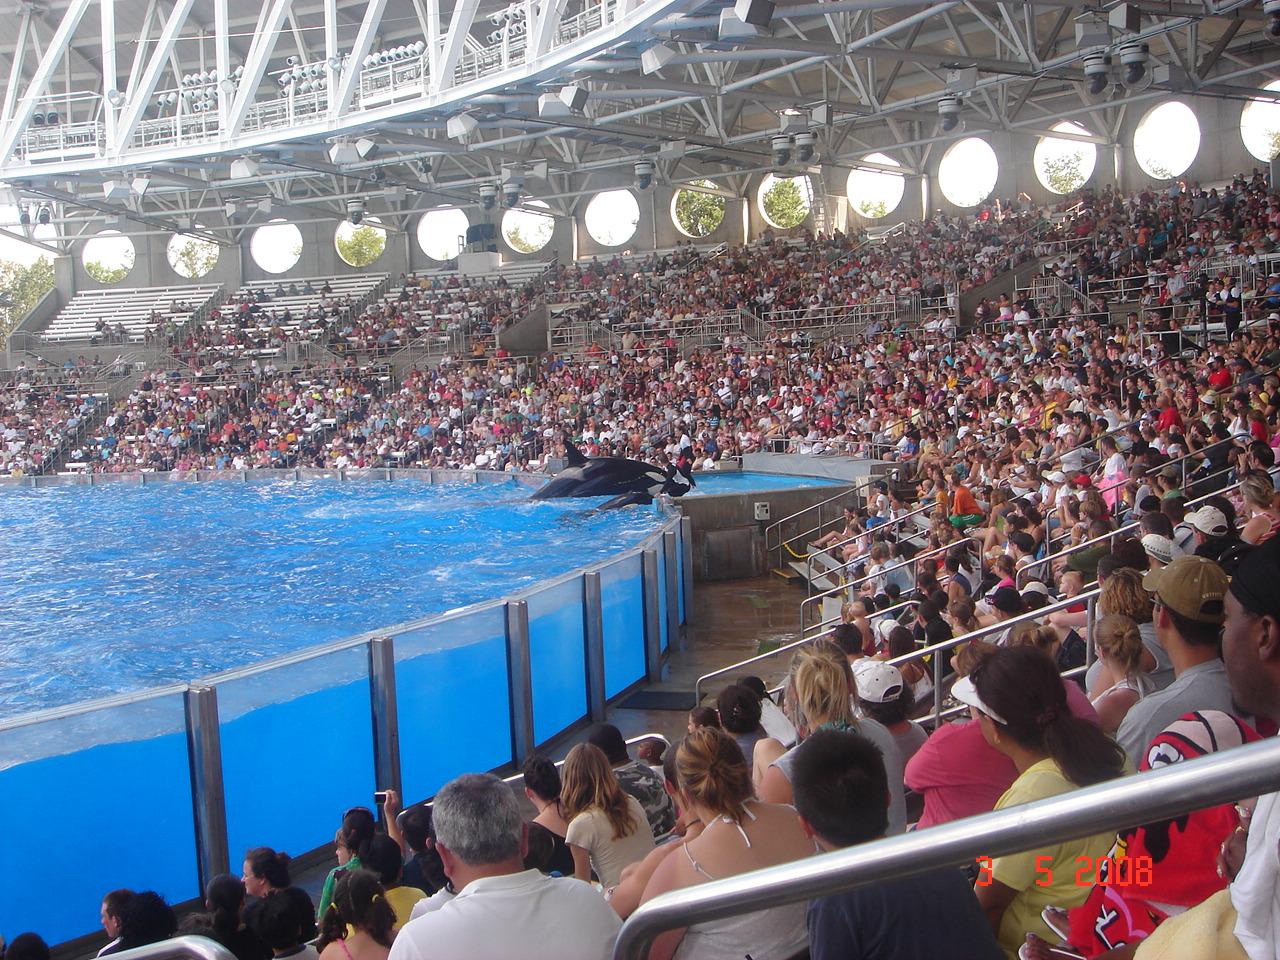 Shamu Stadium at Sea World in Orlando